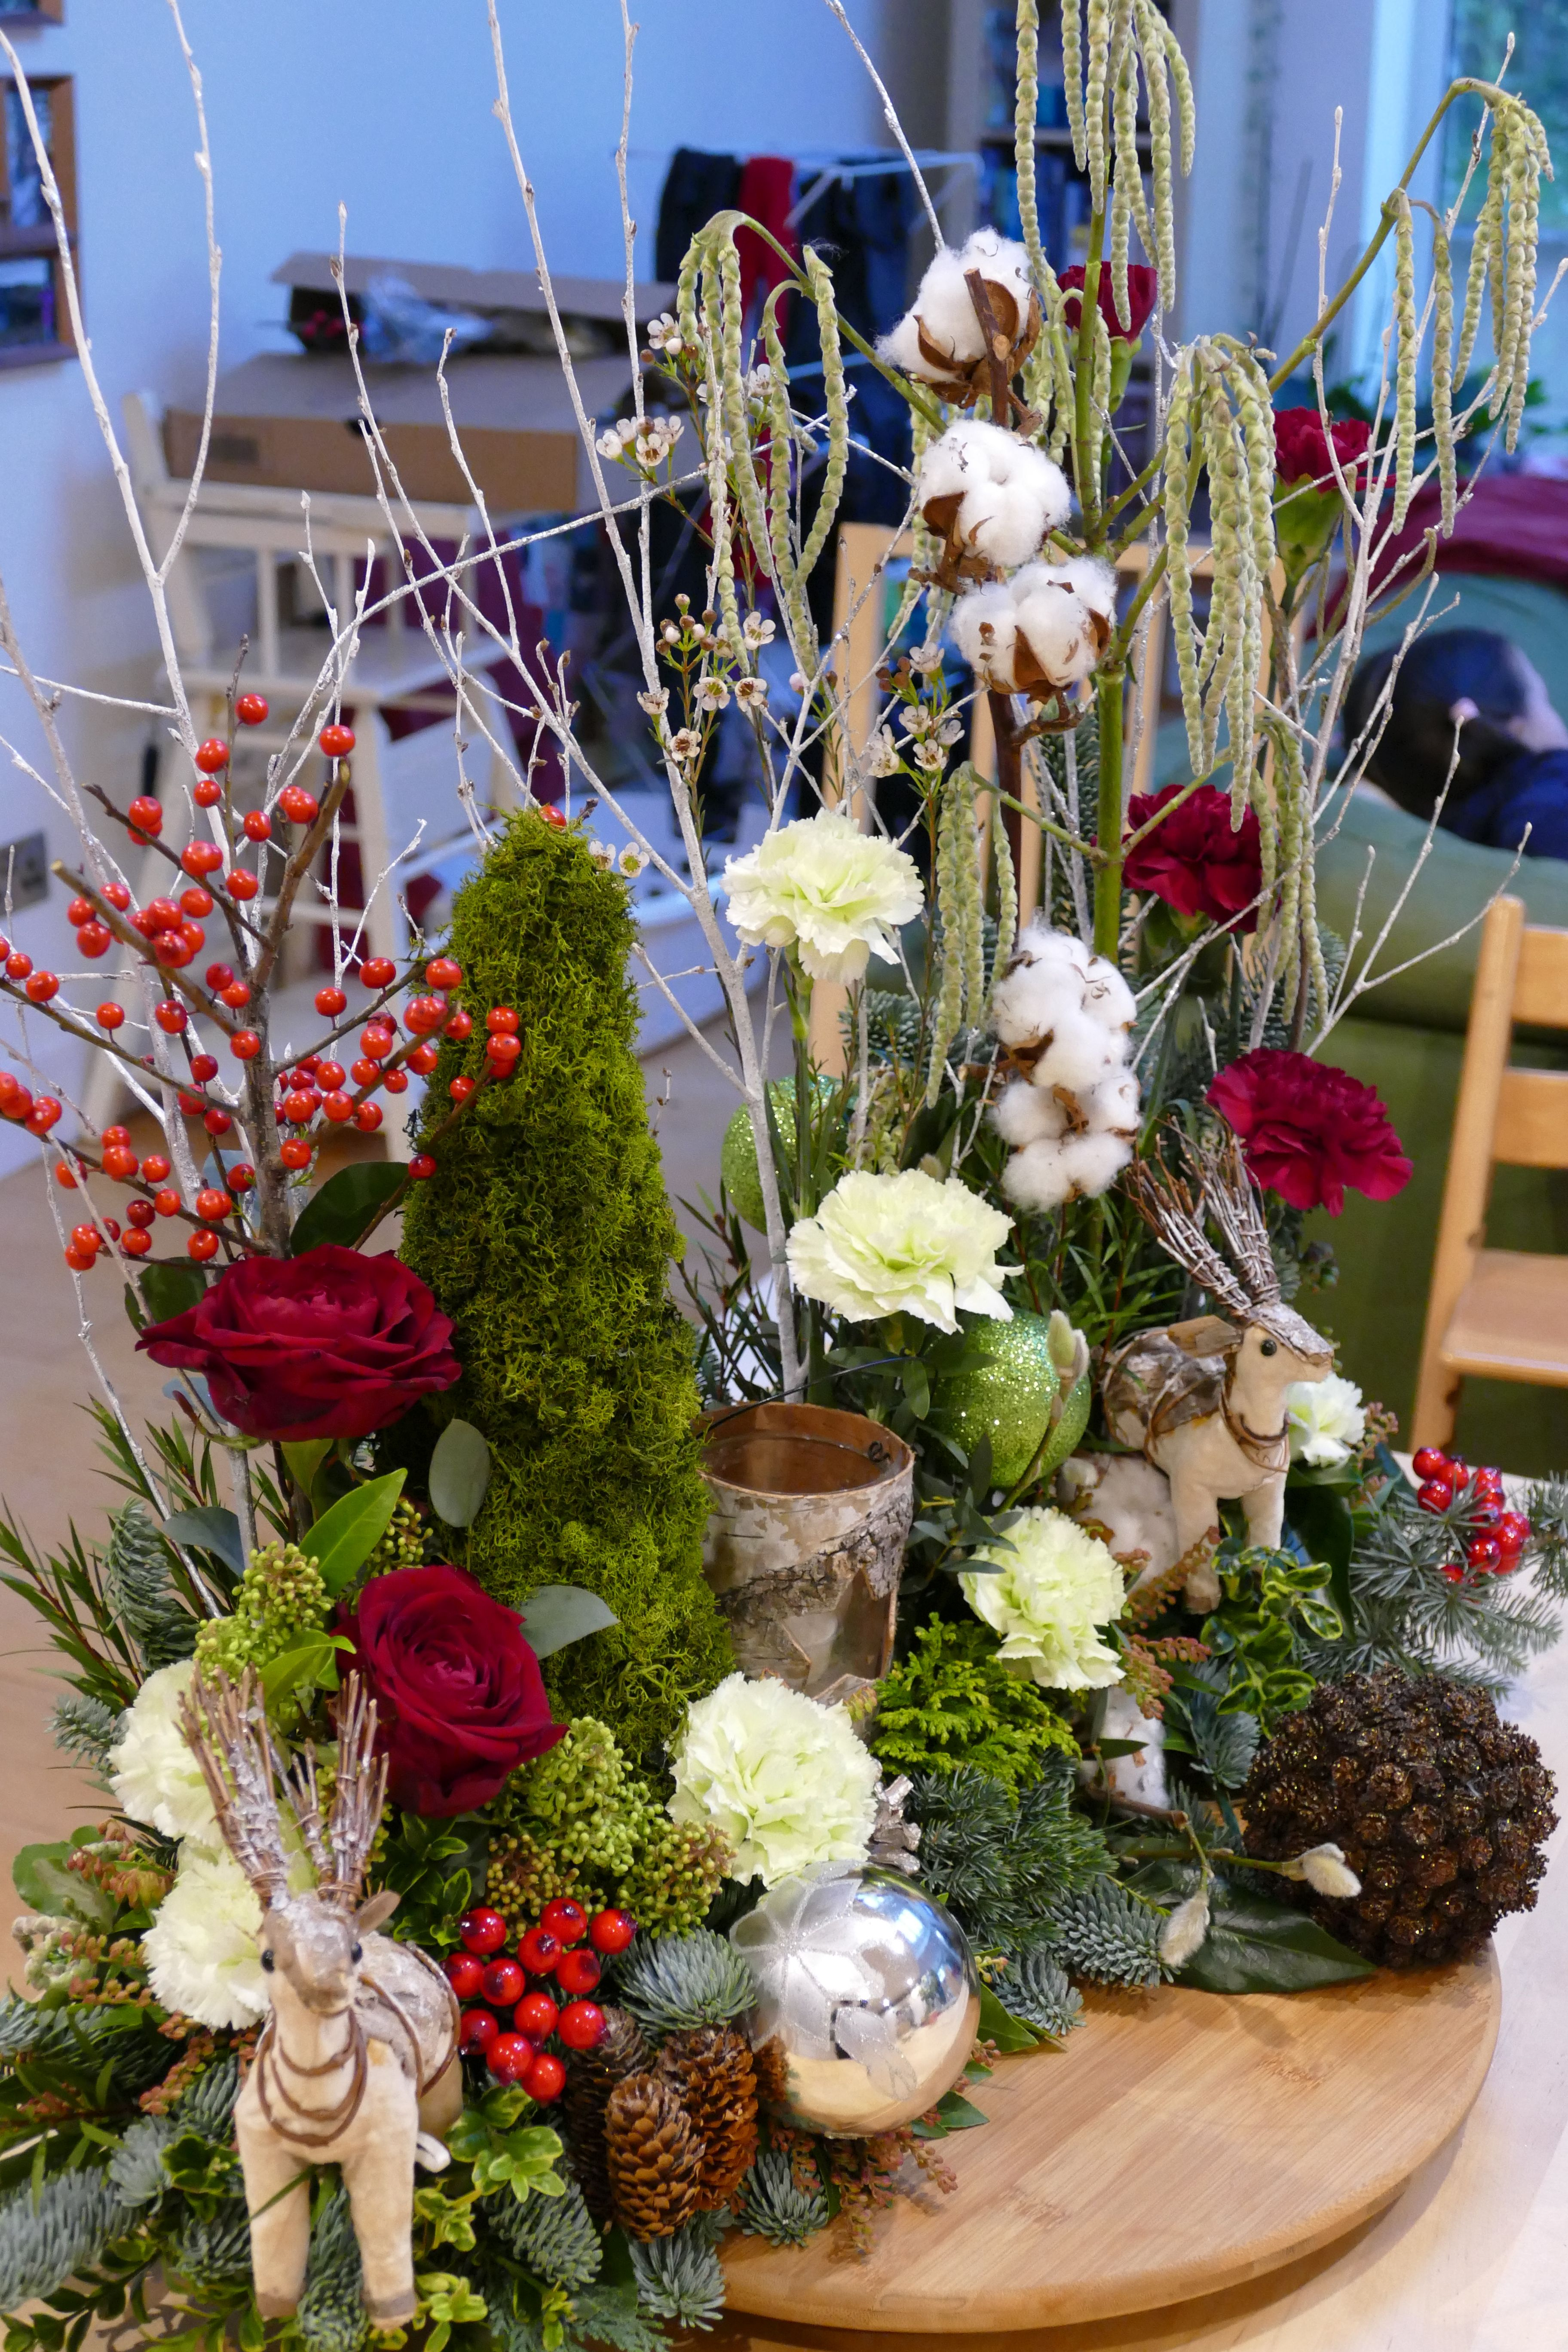 Christmas Table Design by Mel Harris Dec 2016